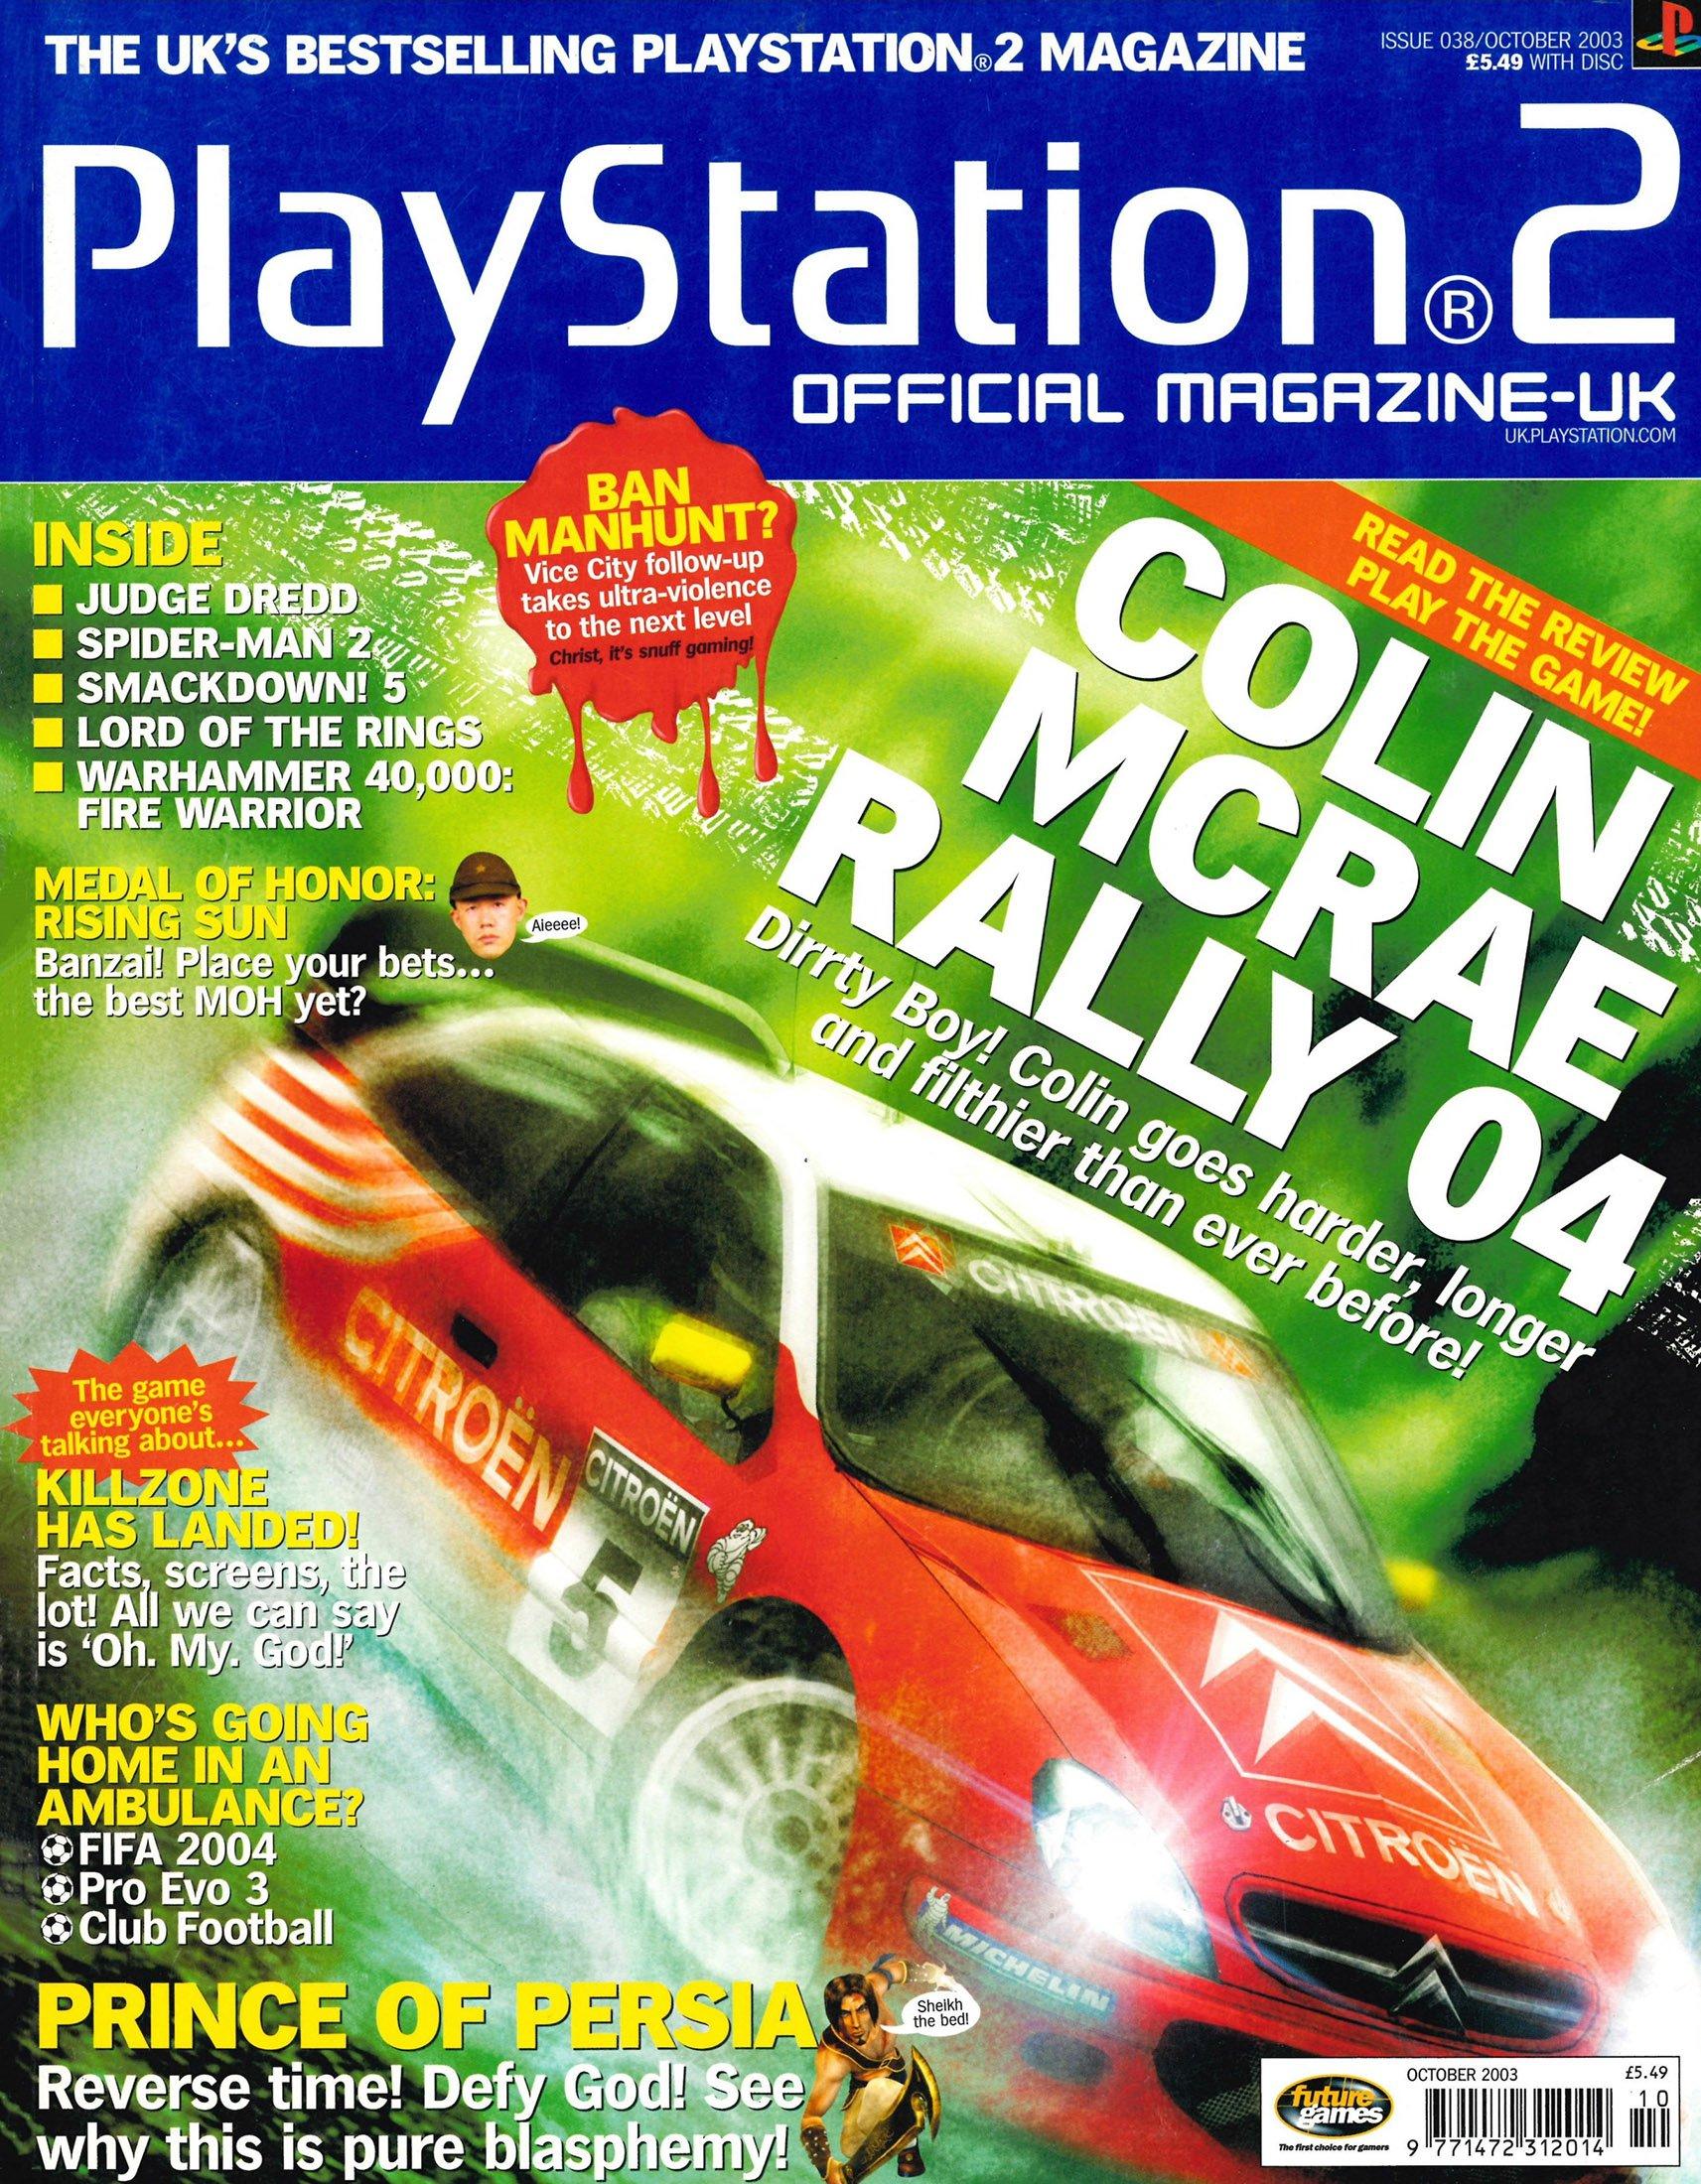 Official Playstation 2 Magazine UK 038 (October 2003)